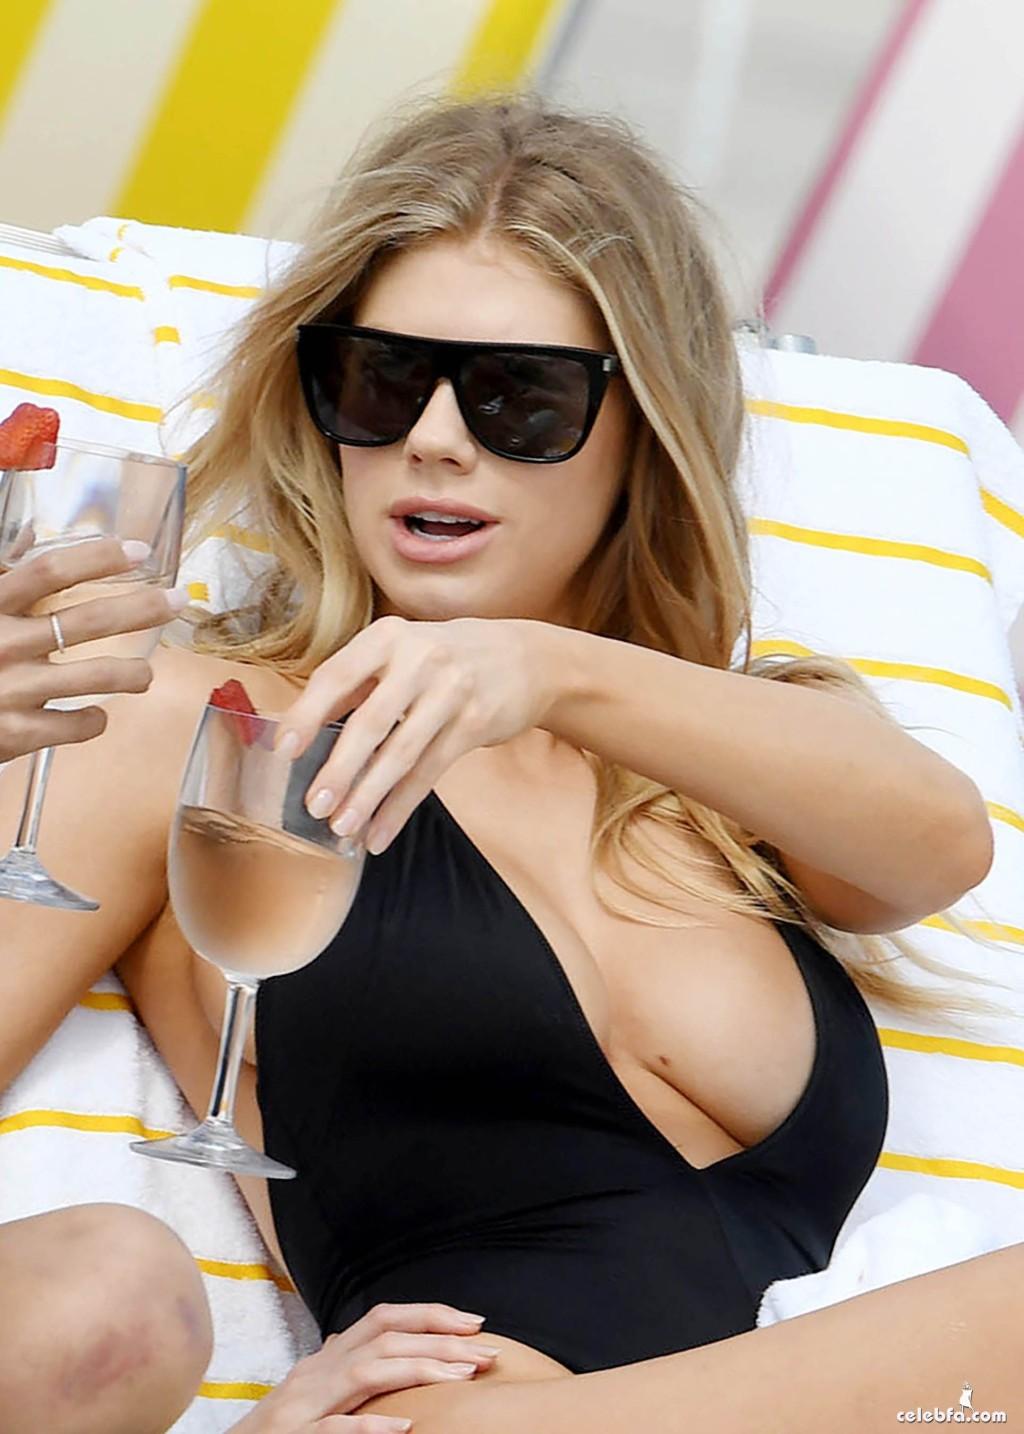 Charlotte McKinney Suffers A Wardrobe Malfunction On The Beach In Miami